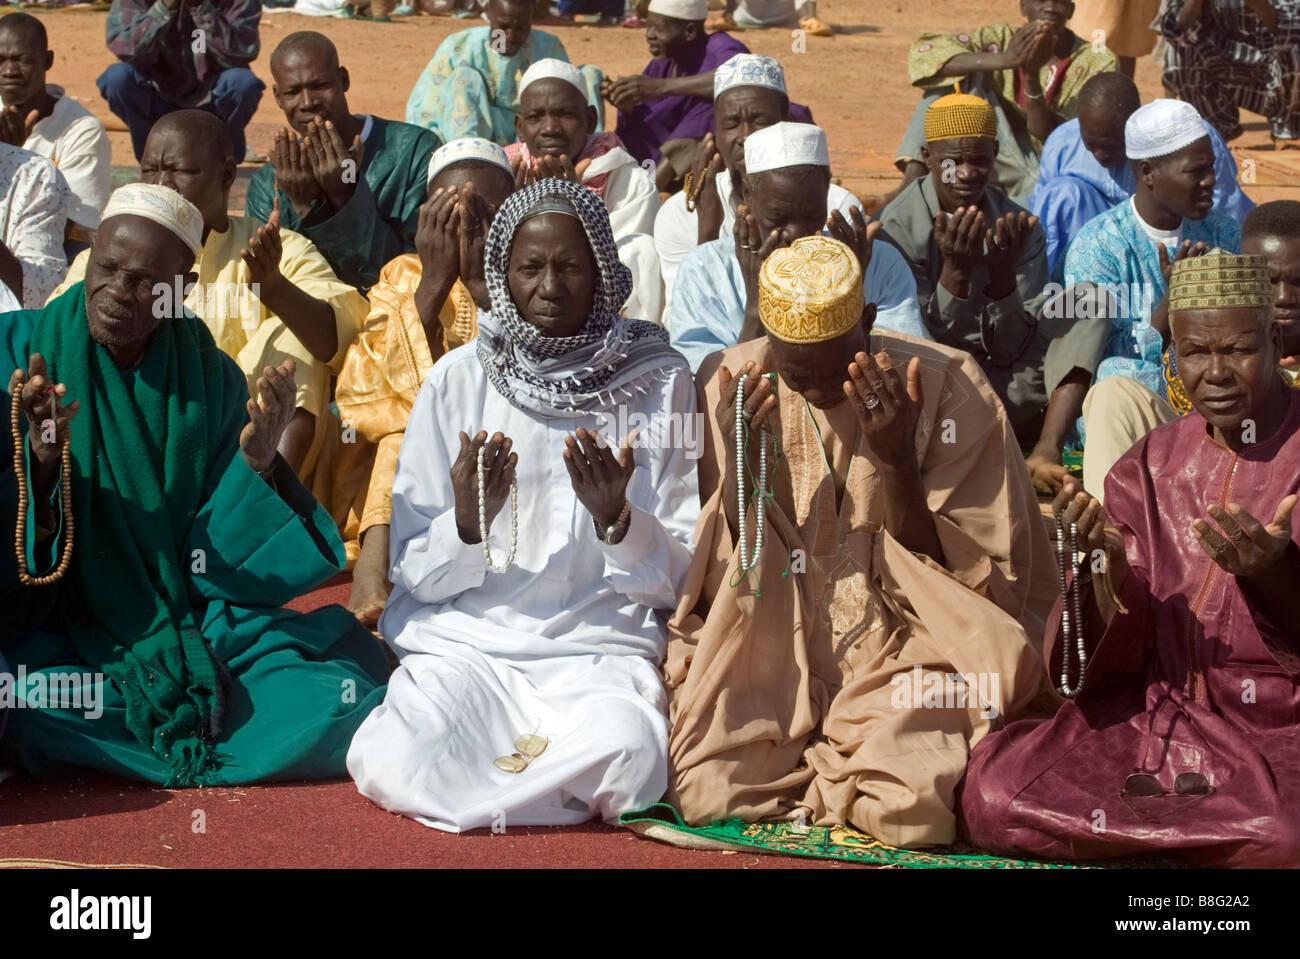 Muslim Africans in a feast of sacrifice pray Ouagadougou Burkina Faso - Stock Image